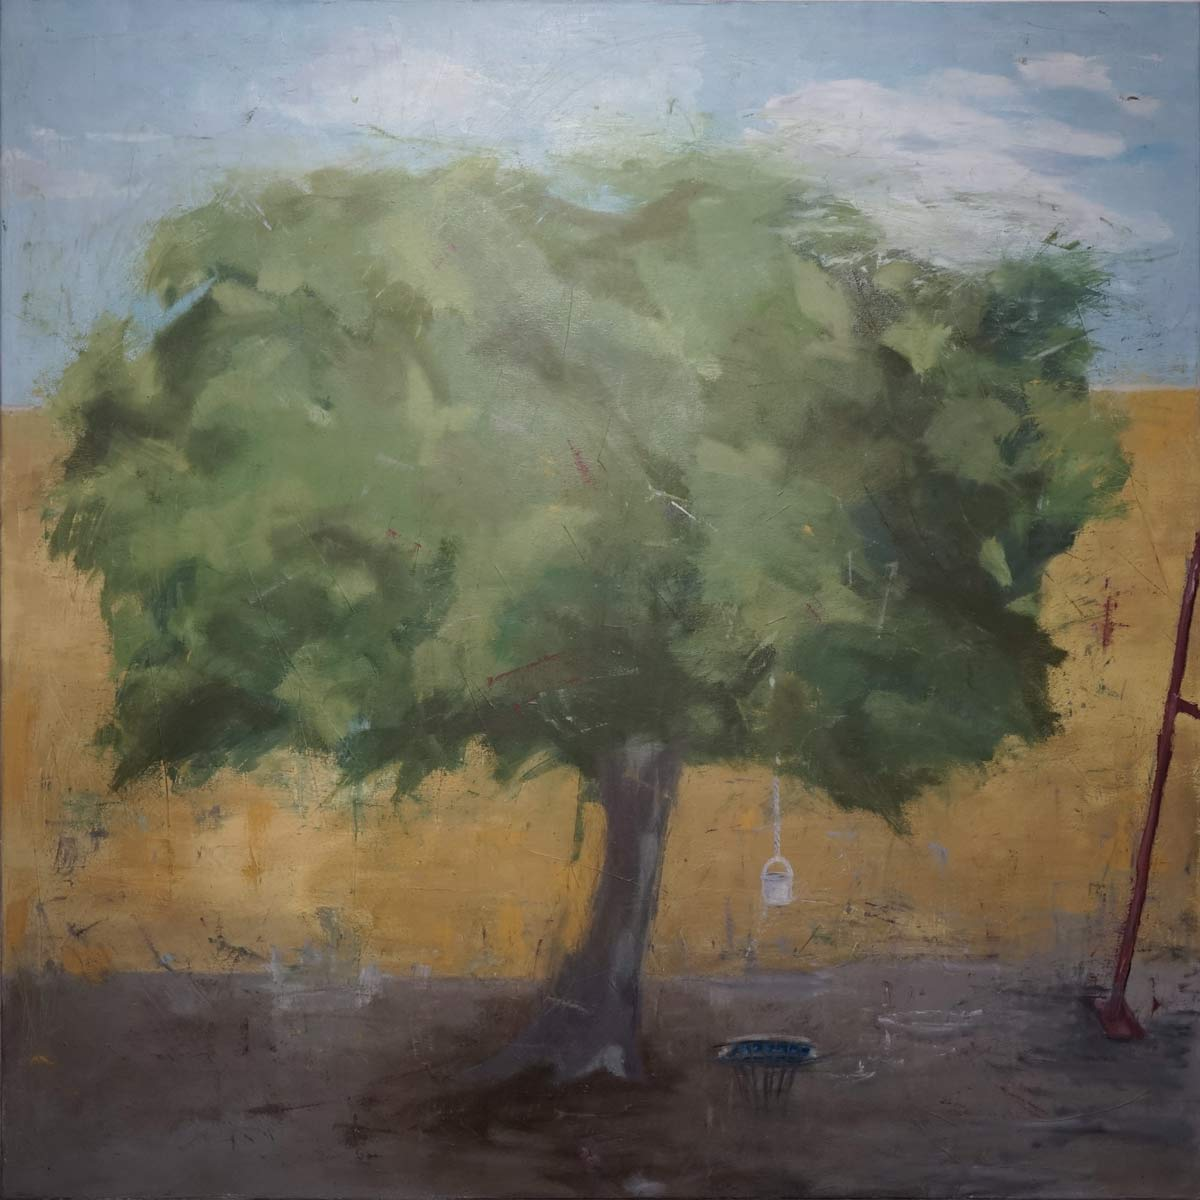 Shirin Ashkari - Kindheitslabor - oilpainting 118x118 cm